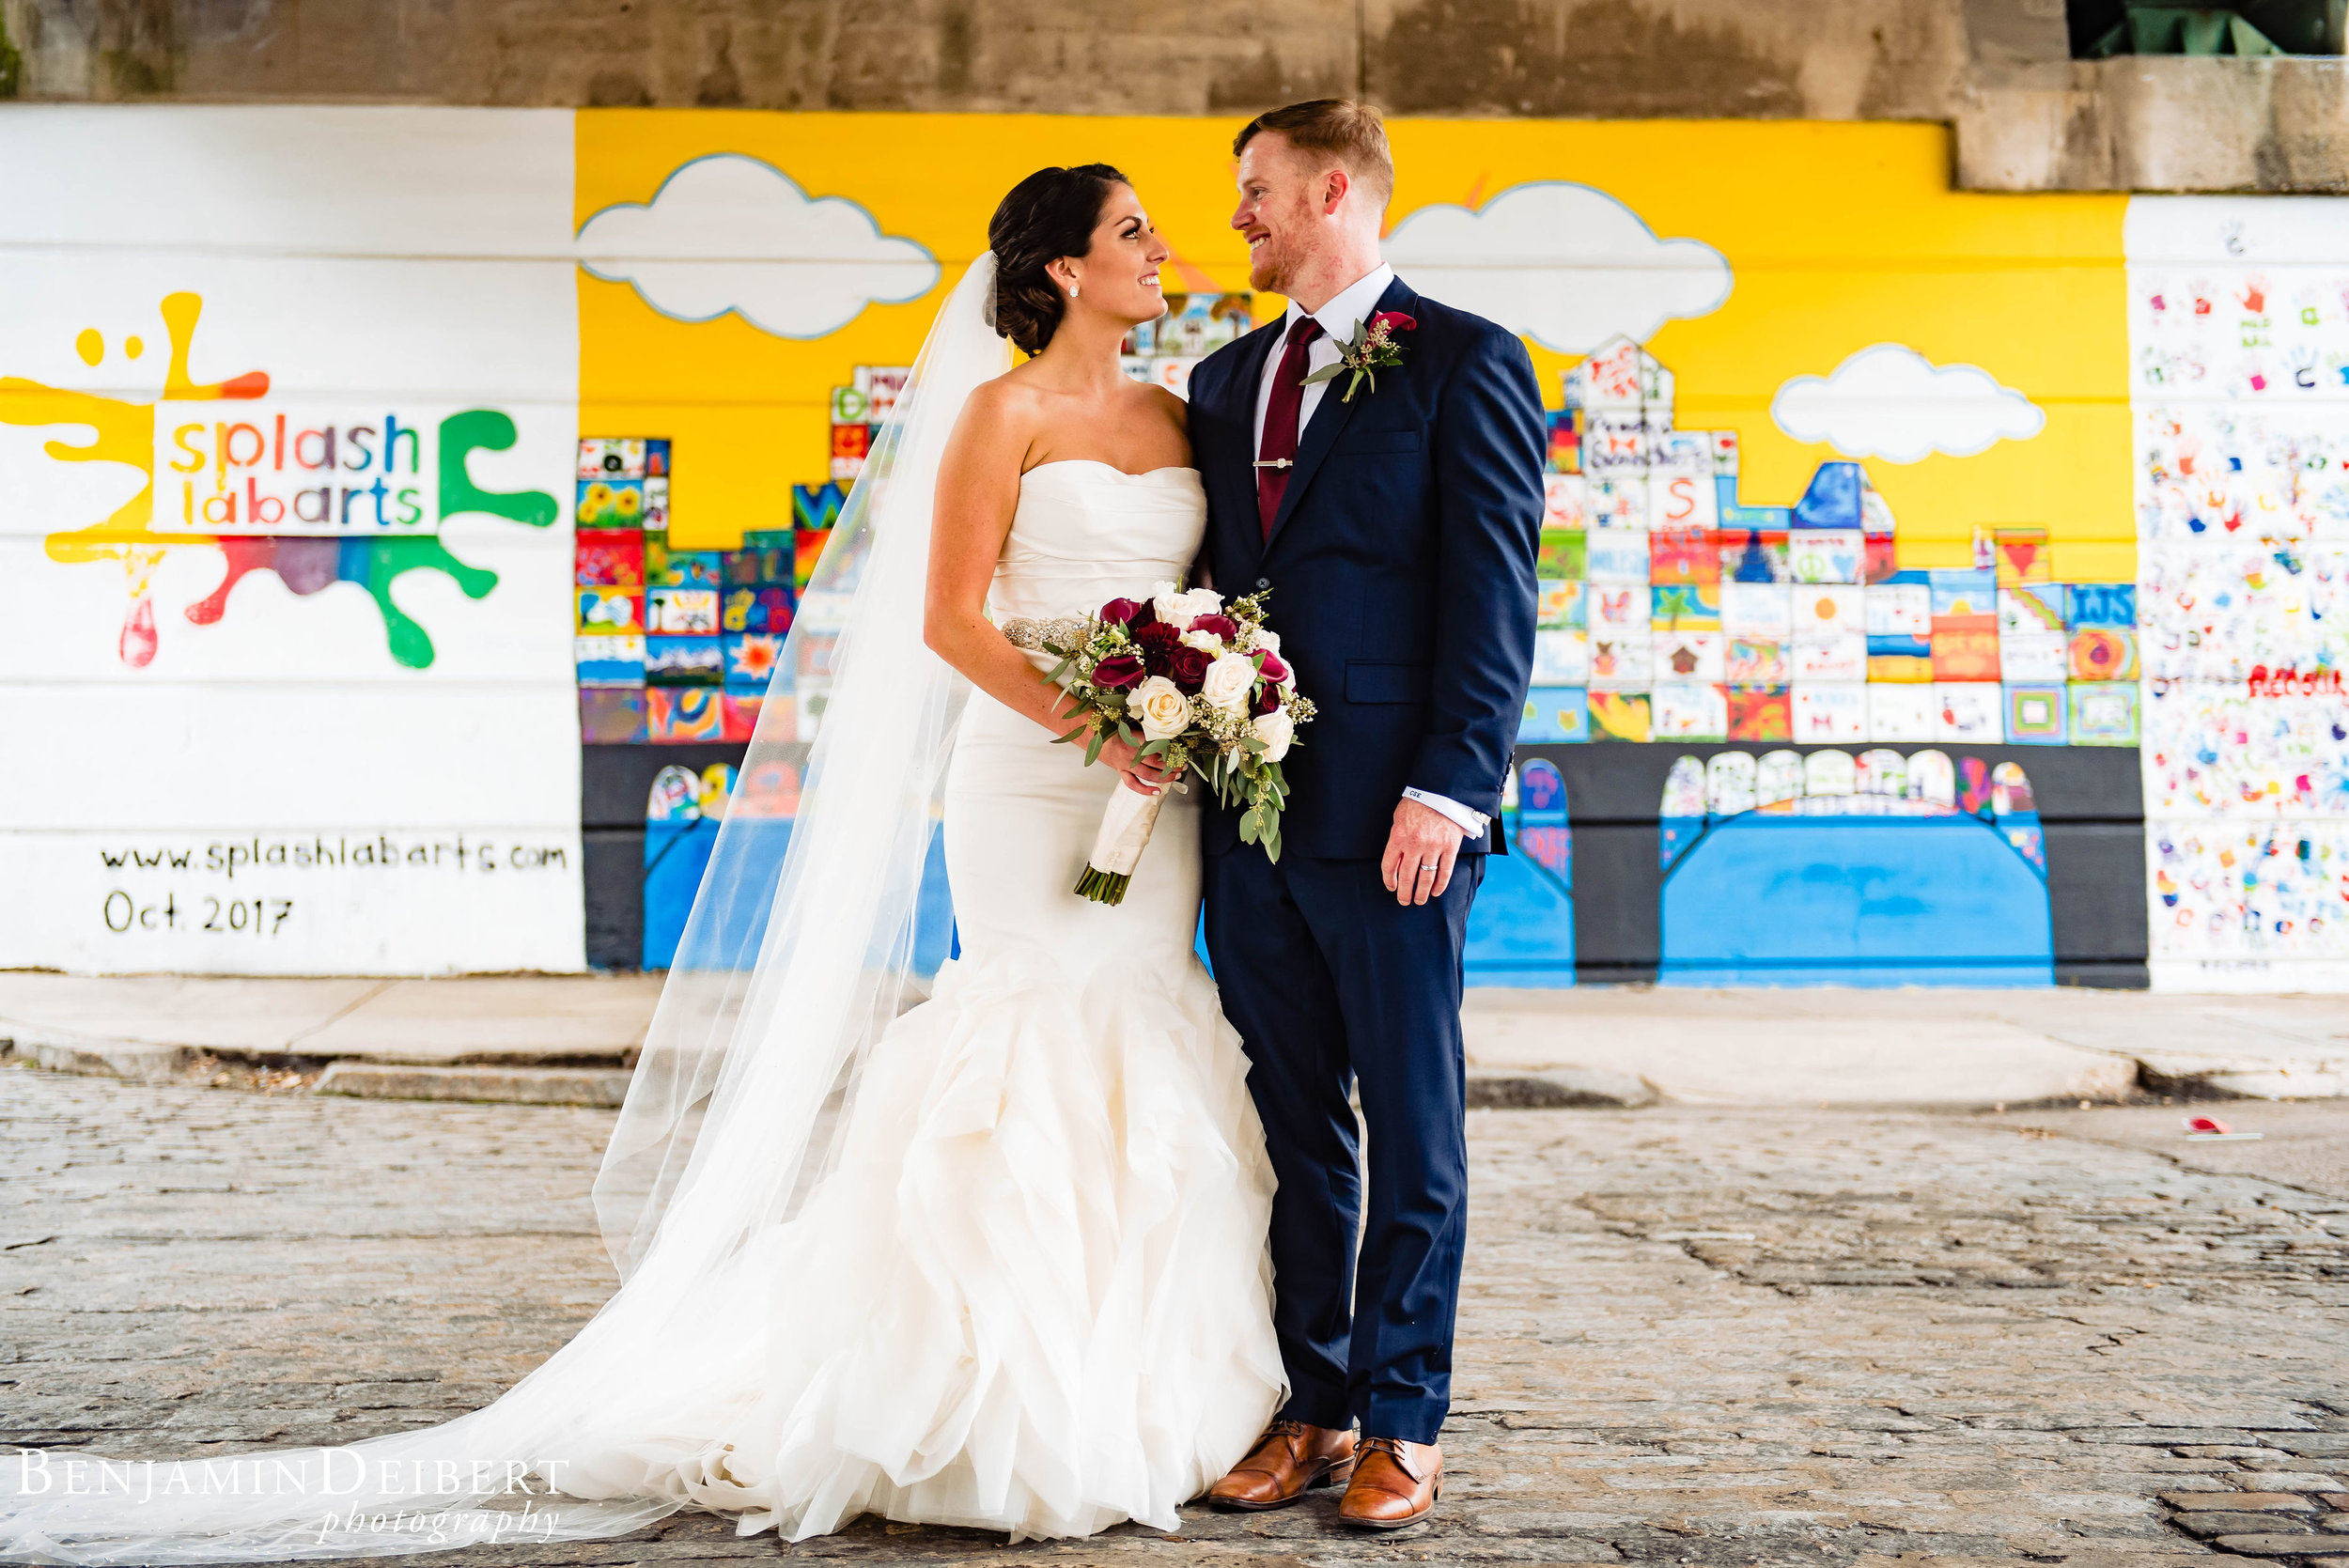 TeghanandChris_BridgemensBallroom_Wedding-58.jpg